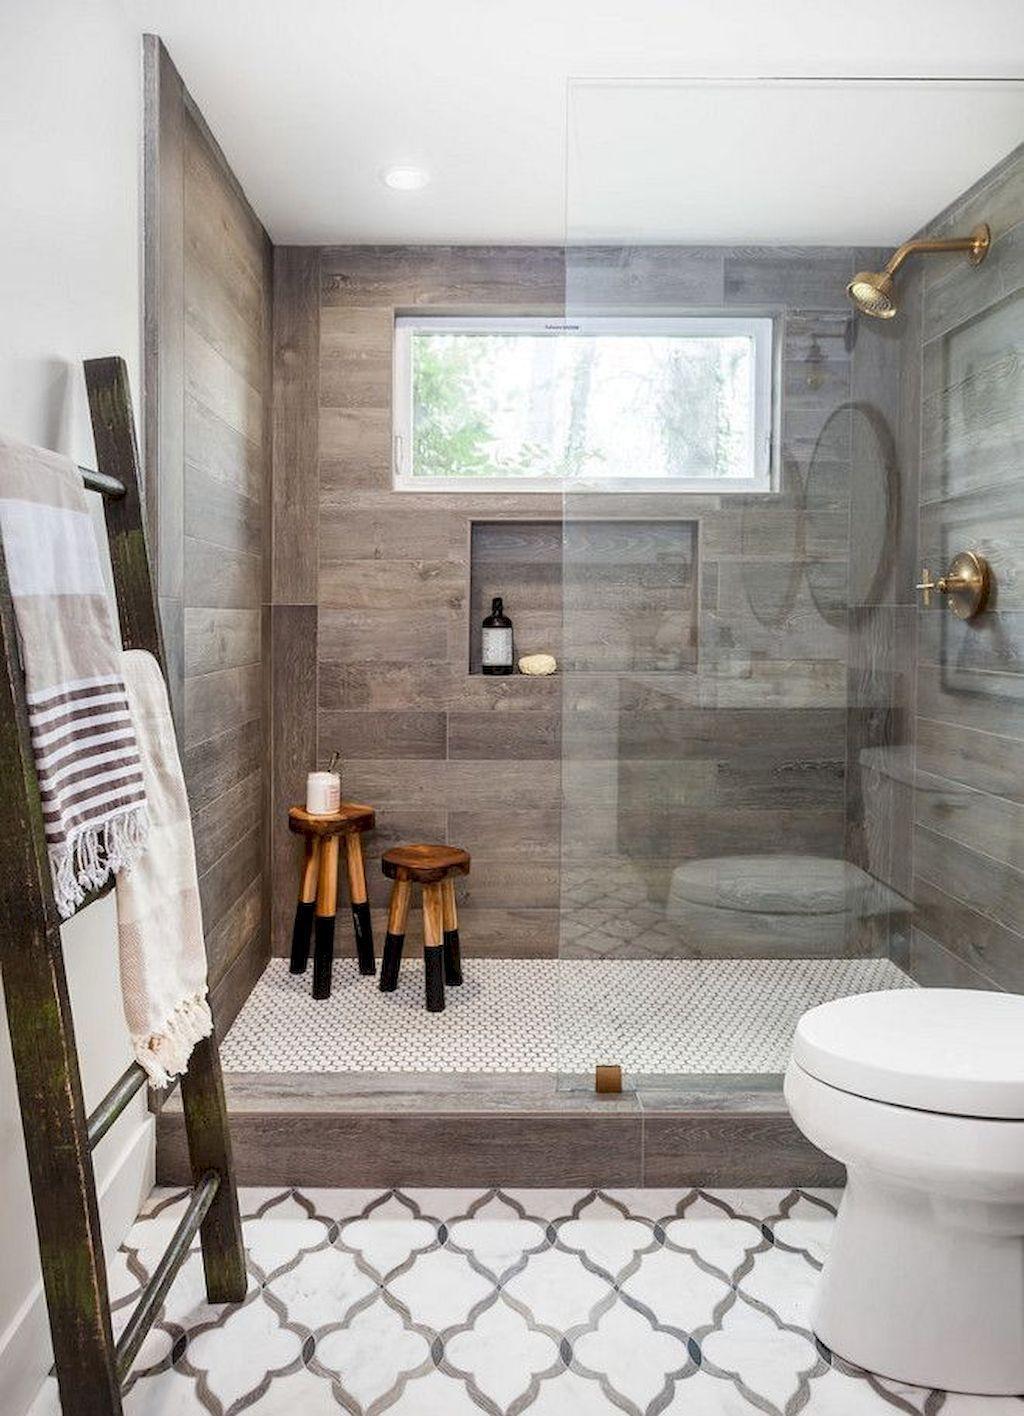 Bathroom Tile Ideas Floor Shower Small Natural Grey Farmhouse Neutral Tub Mast Farmhouse Master Bathroom Bathroom Remodel Master Small Bathroom Remodel